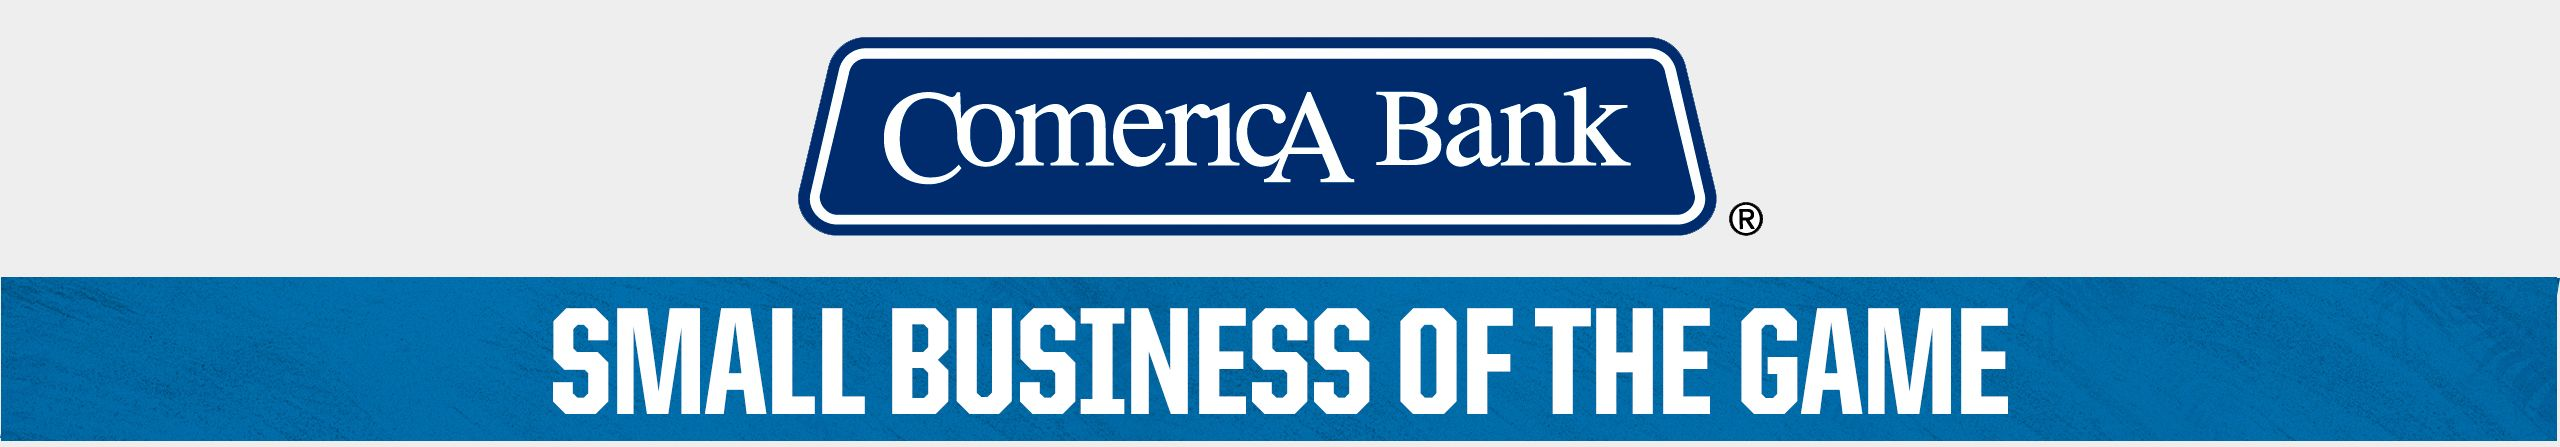 comerica-small-business-header